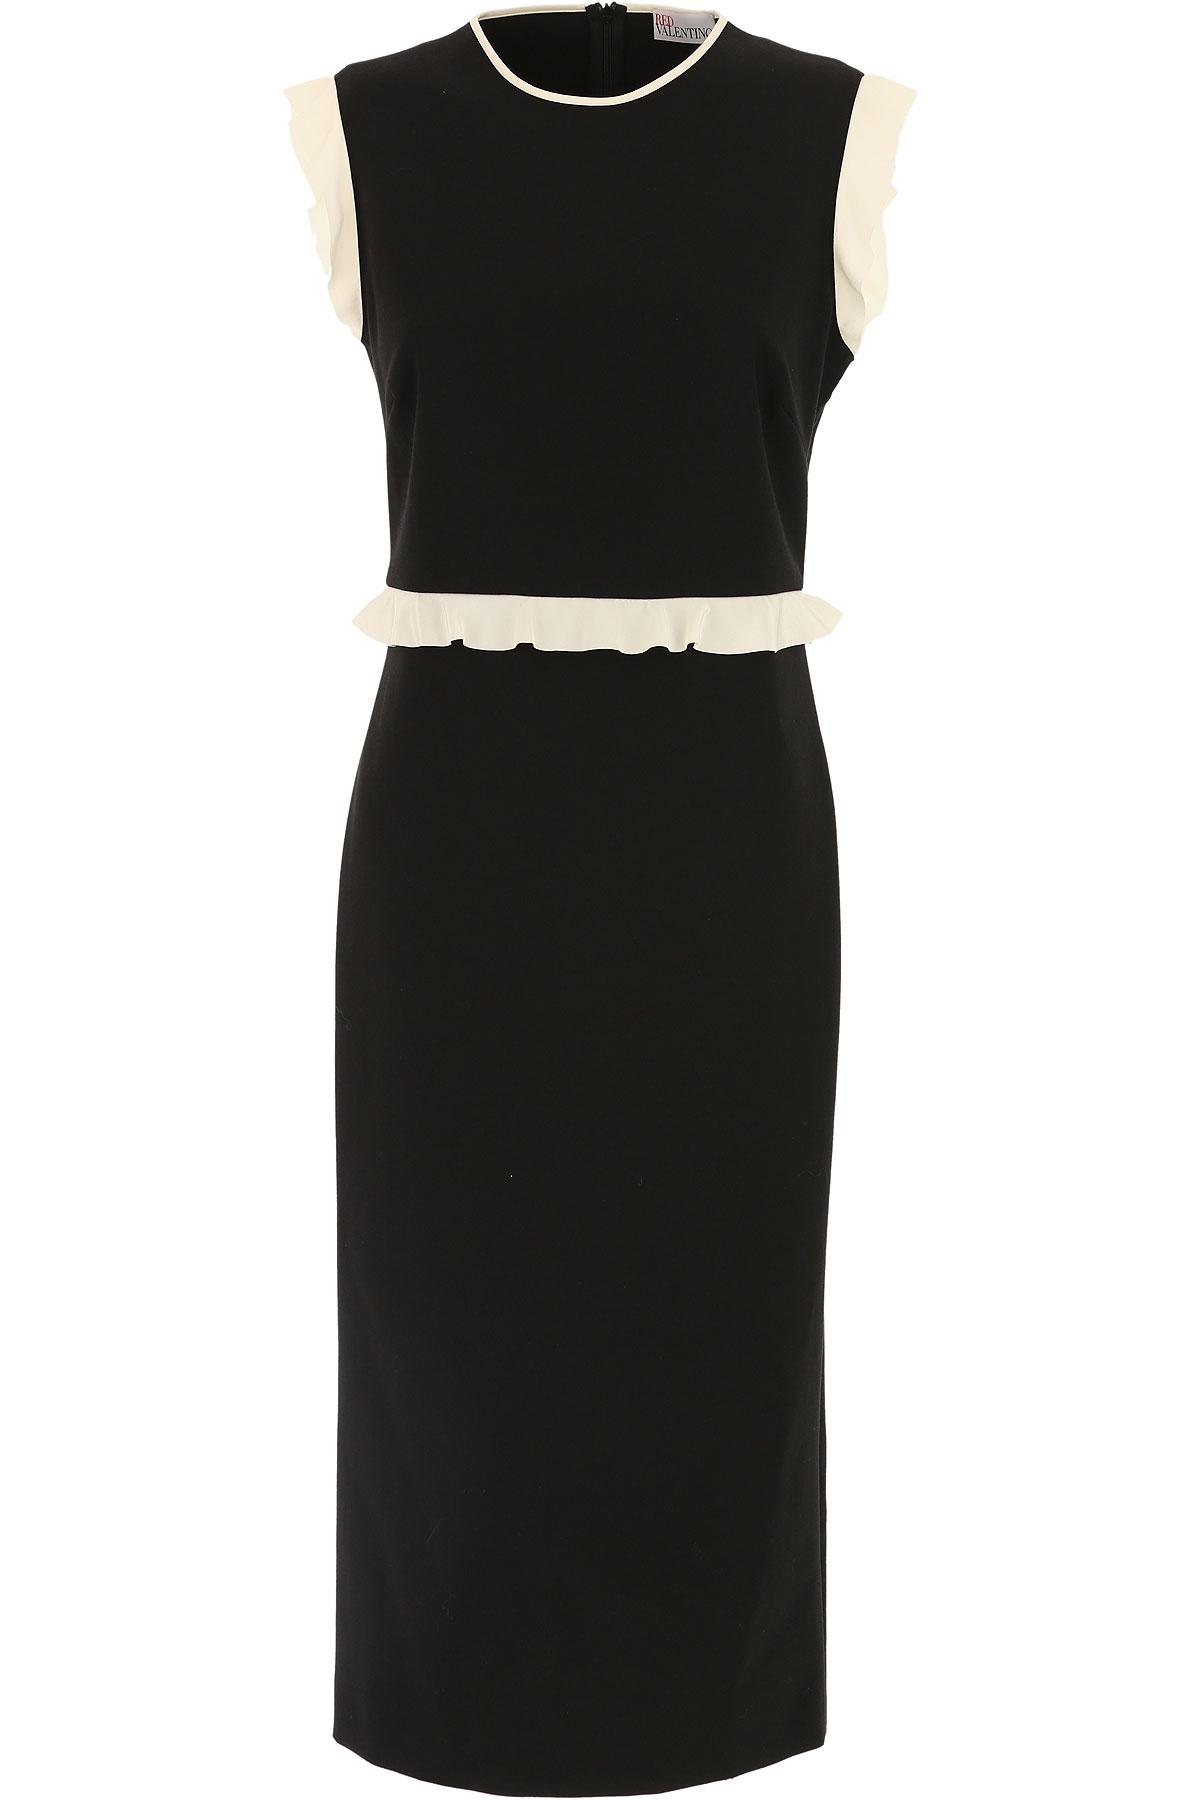 Valentino Robe Femme, Noir, Polyester, 2017, 38 40 42 44 46